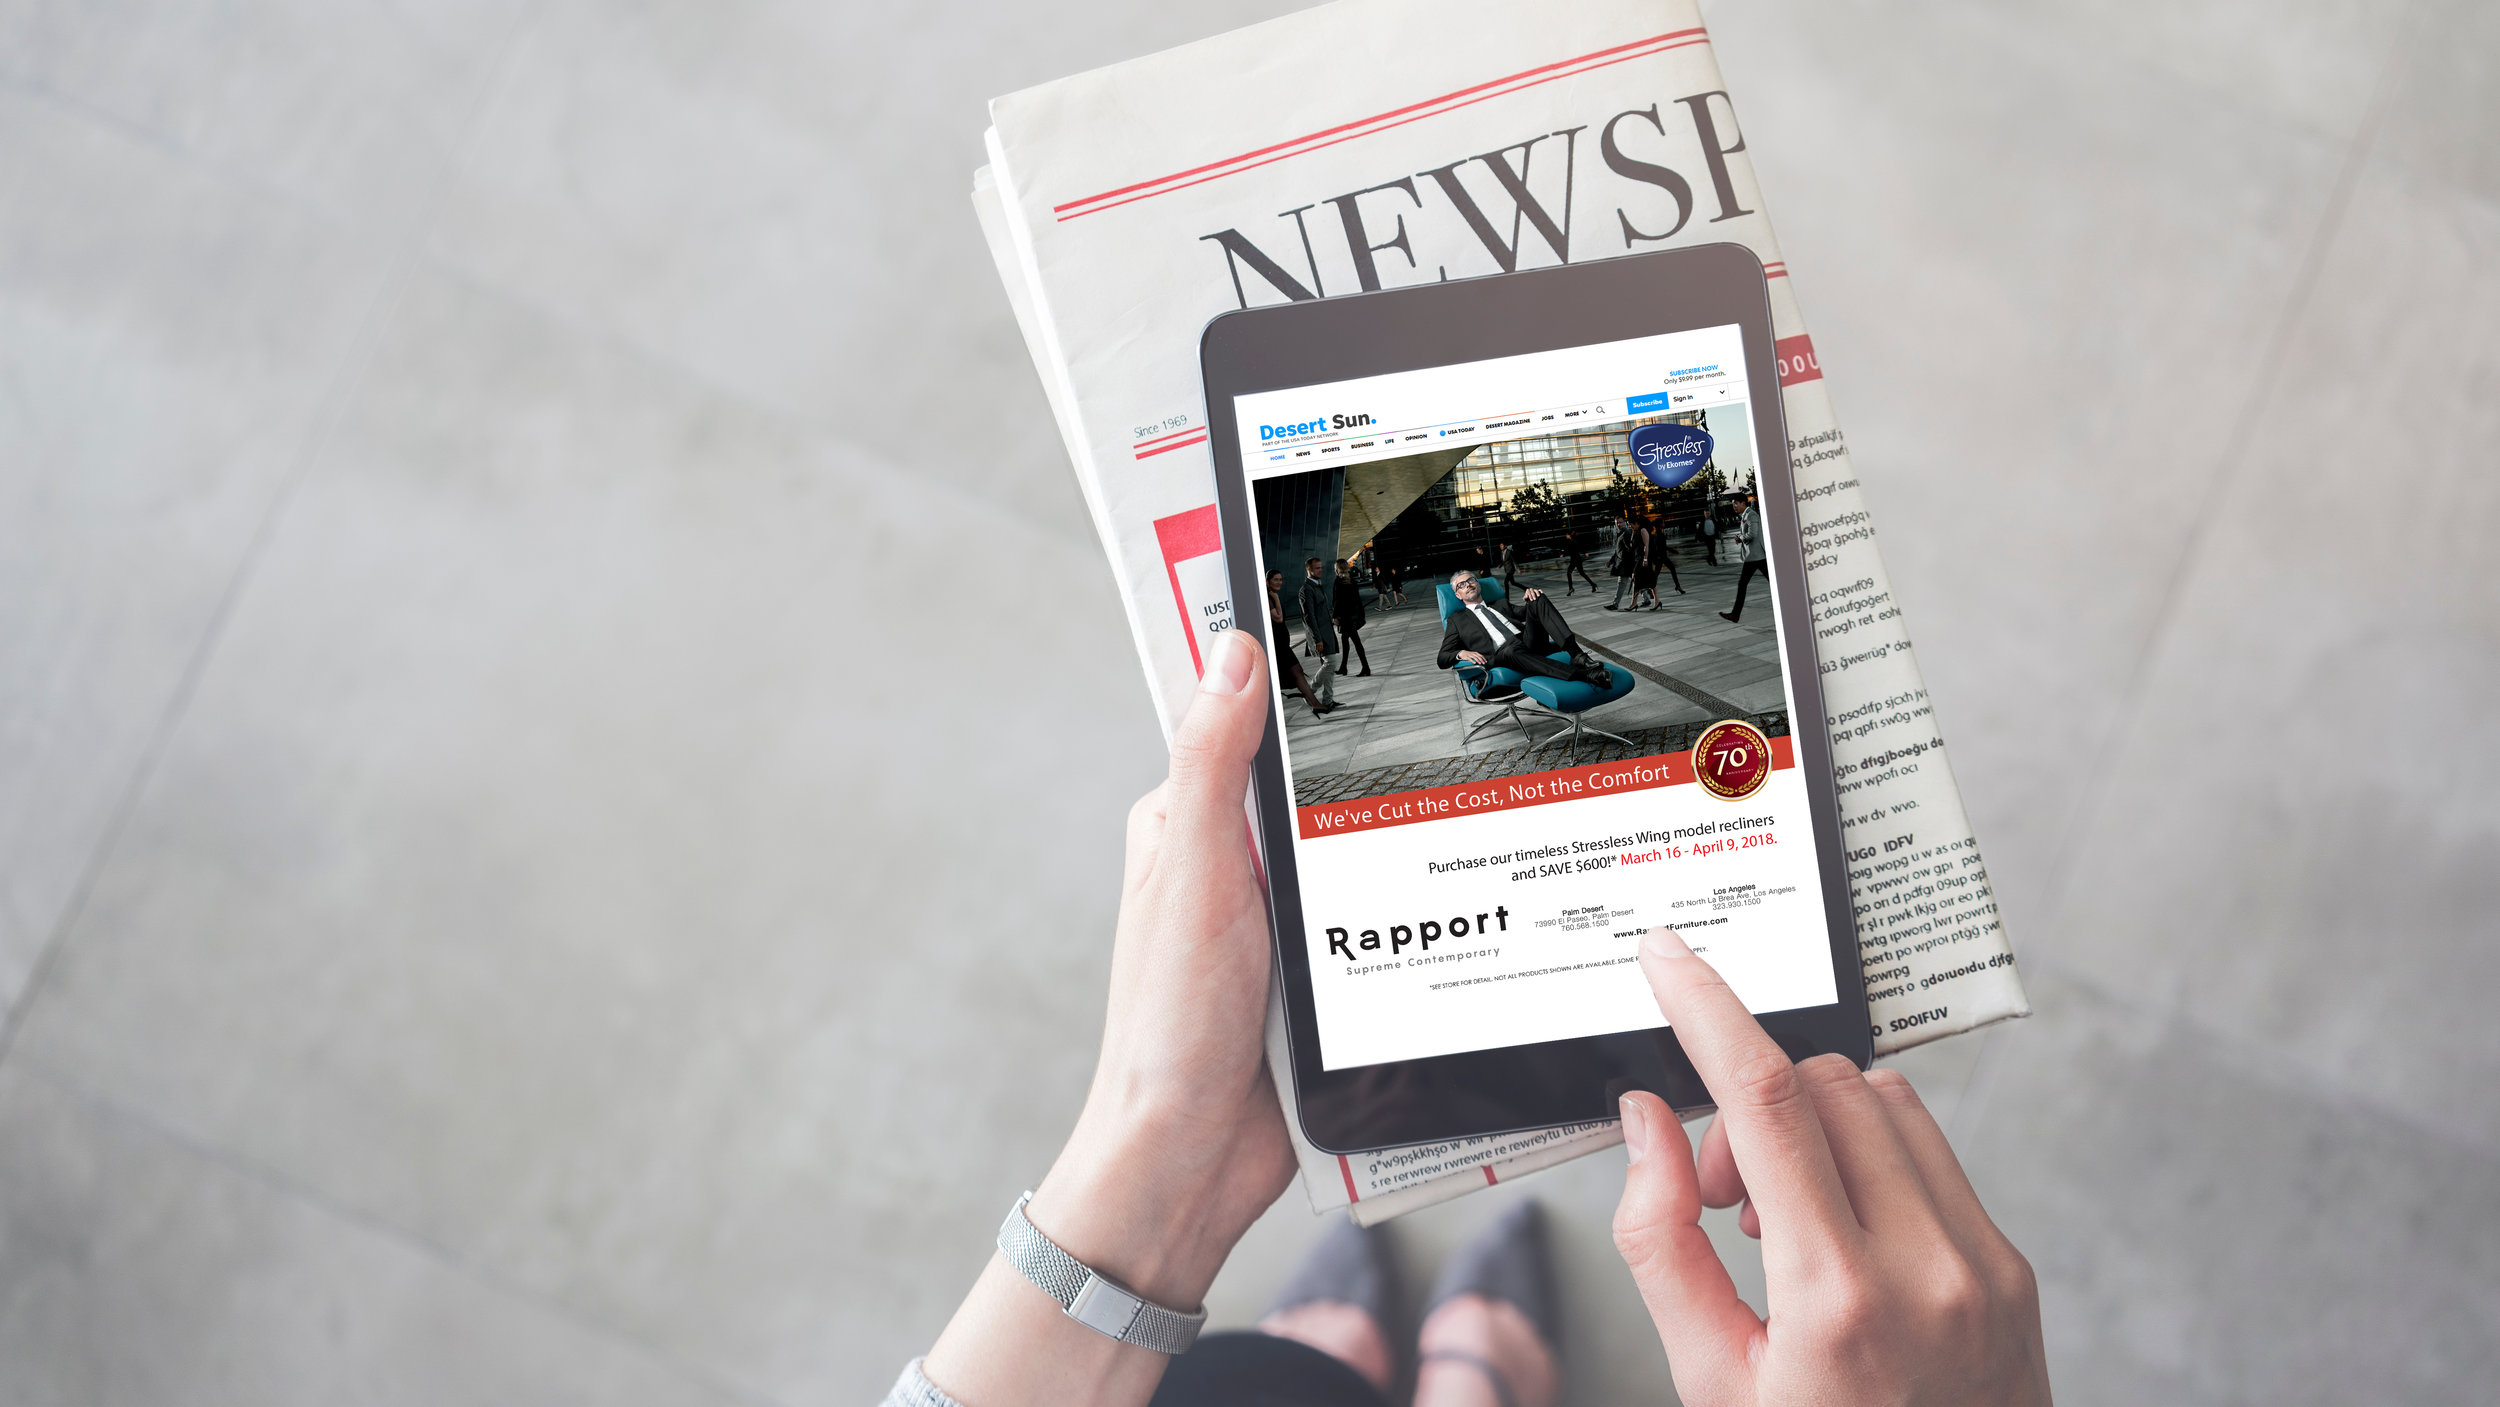 Rapport_DesertSunNewspaper_IPAD11.jpg